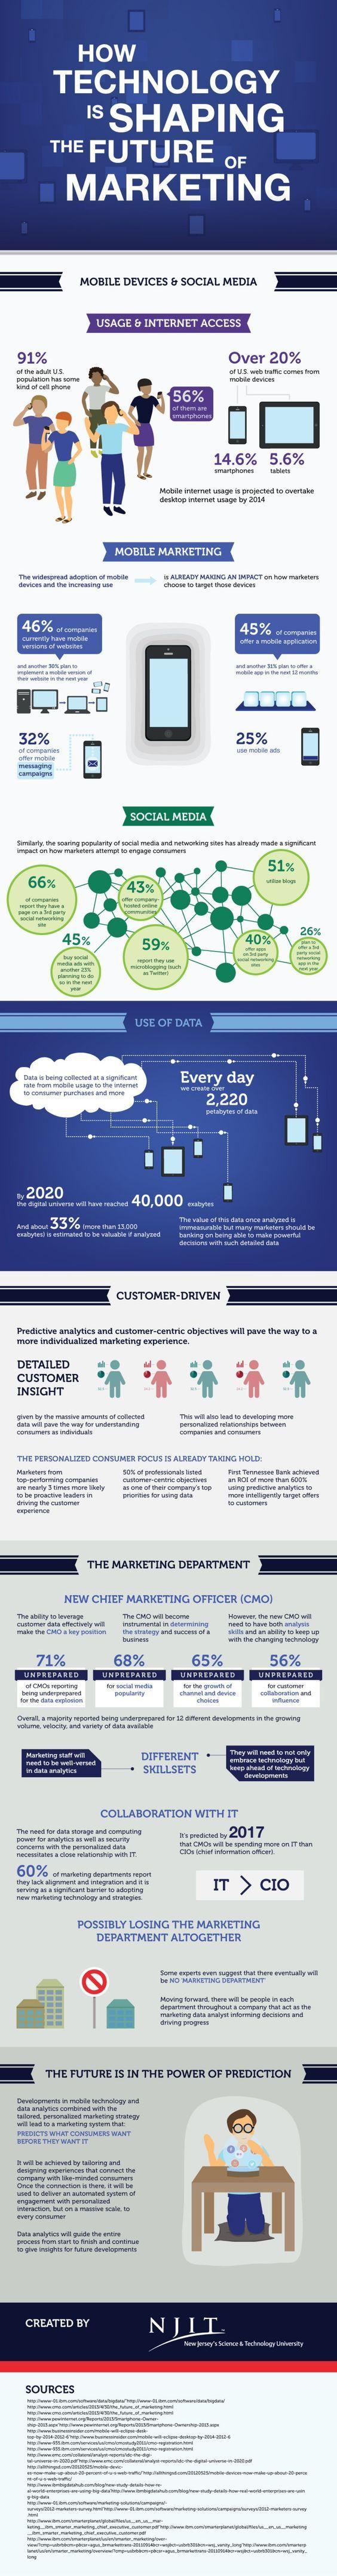 How Technolgy is Shaping the Future of Marketing - Avinash Dangeti - Digital Marketing